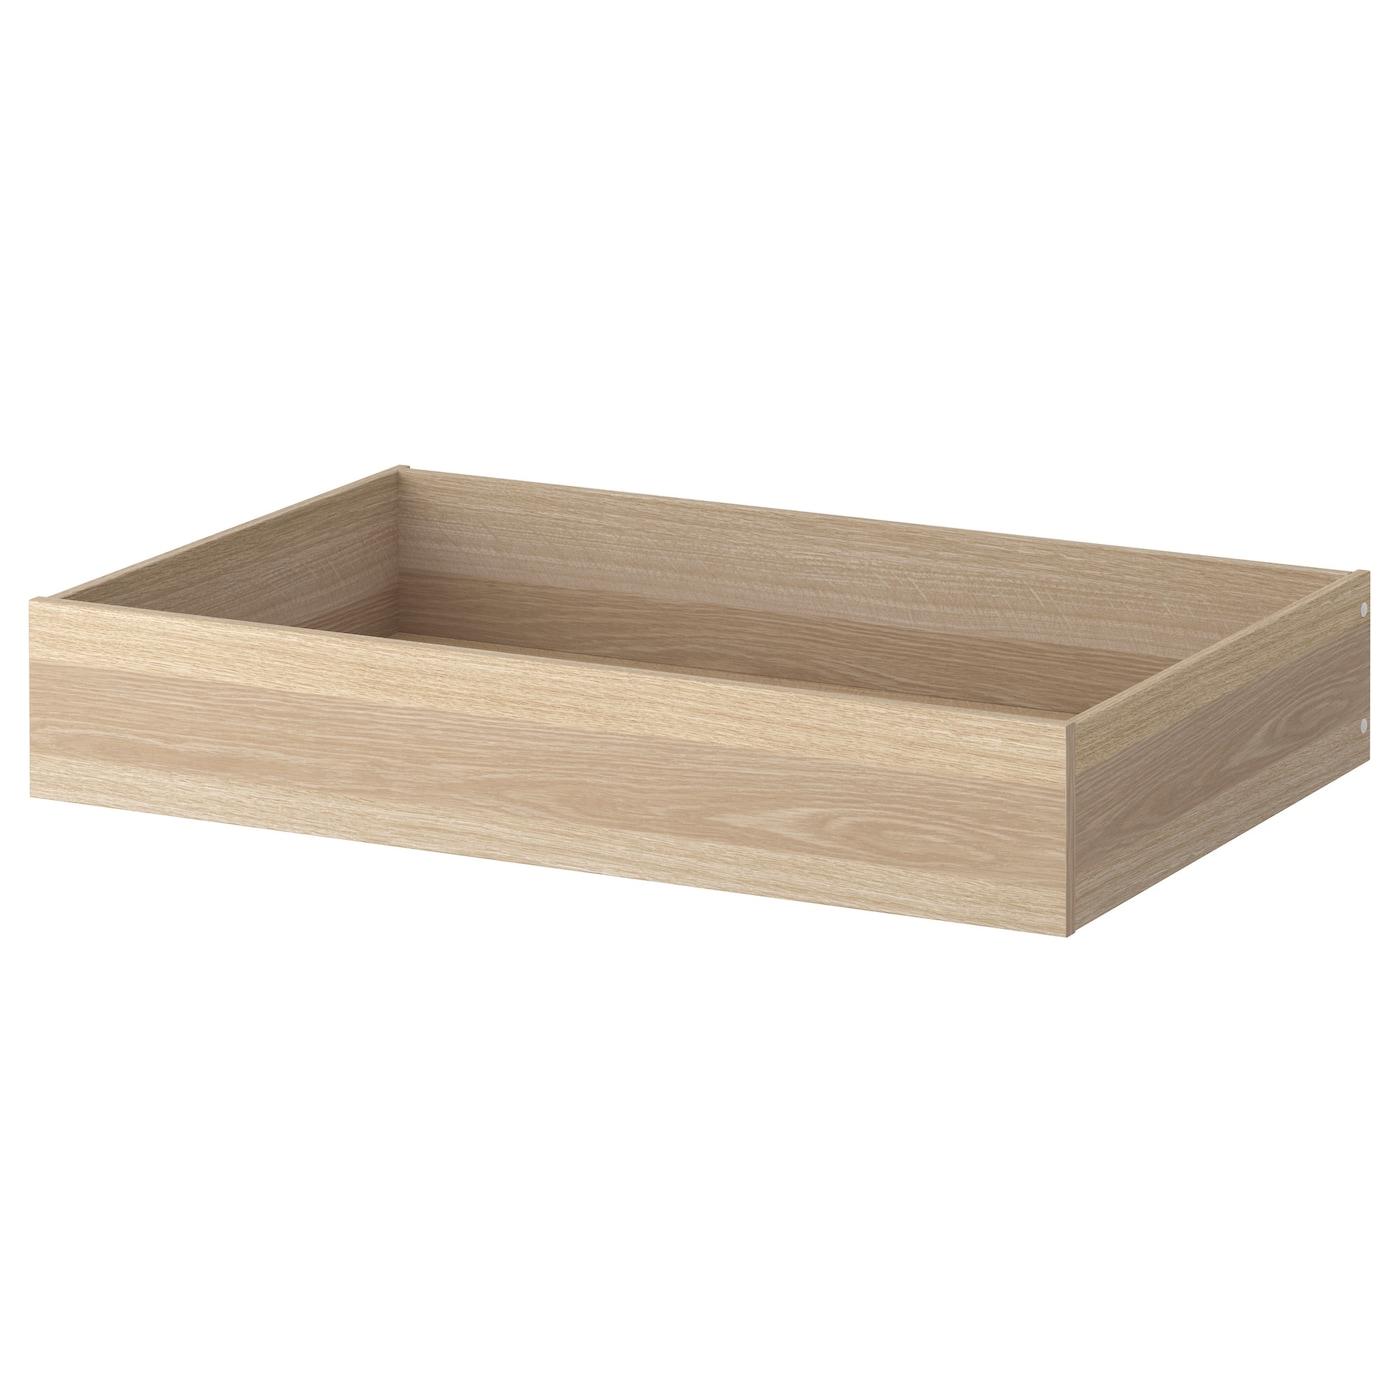 Komplement tiroir effet ch ne blanchi 100x58 cm ikea for Ikea chene blanchi